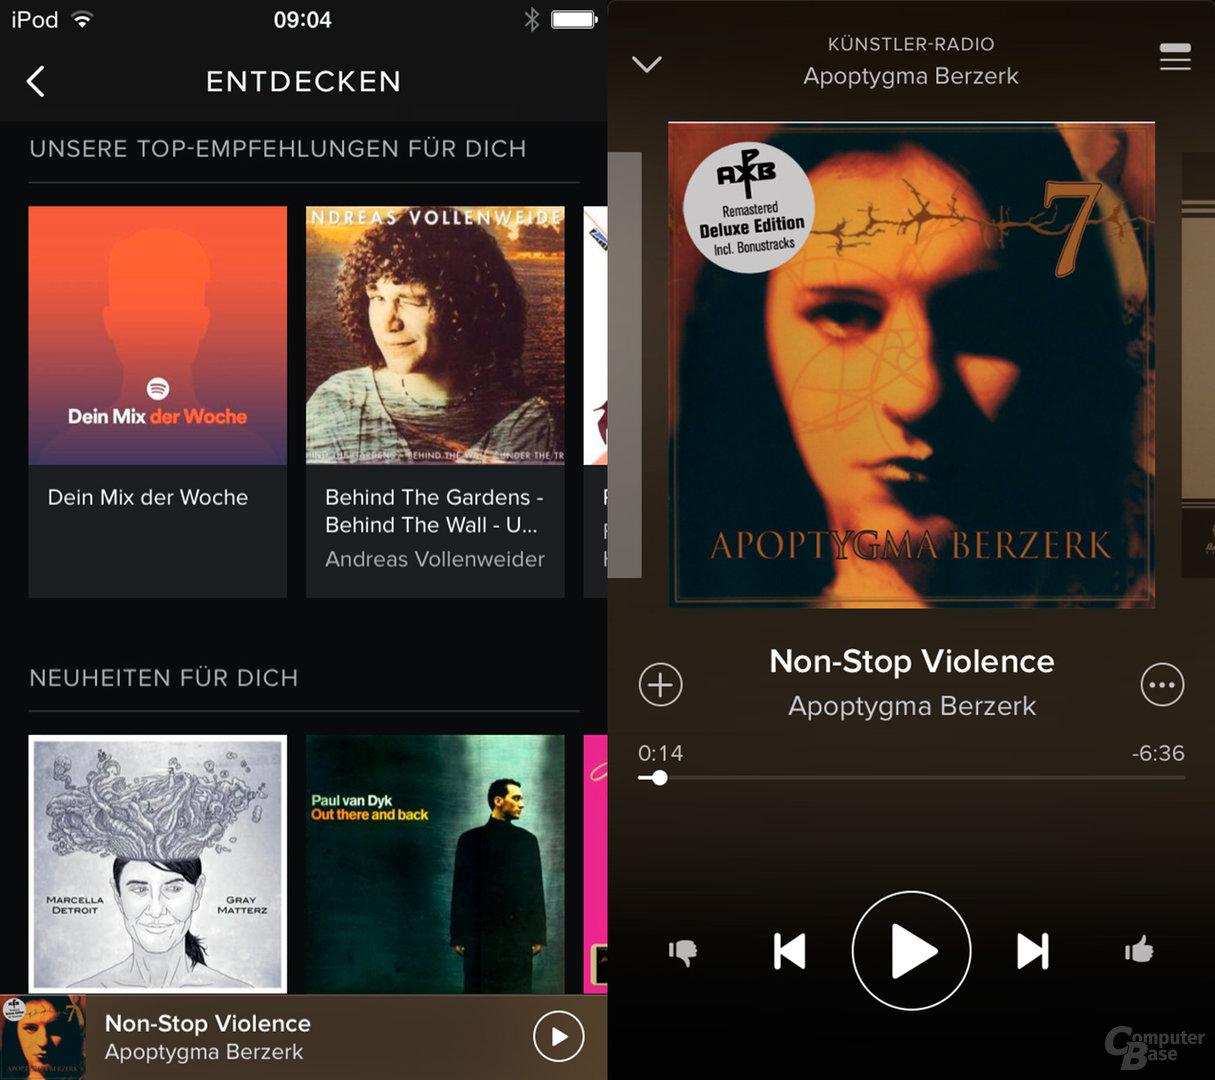 Spotify auf dem iPod